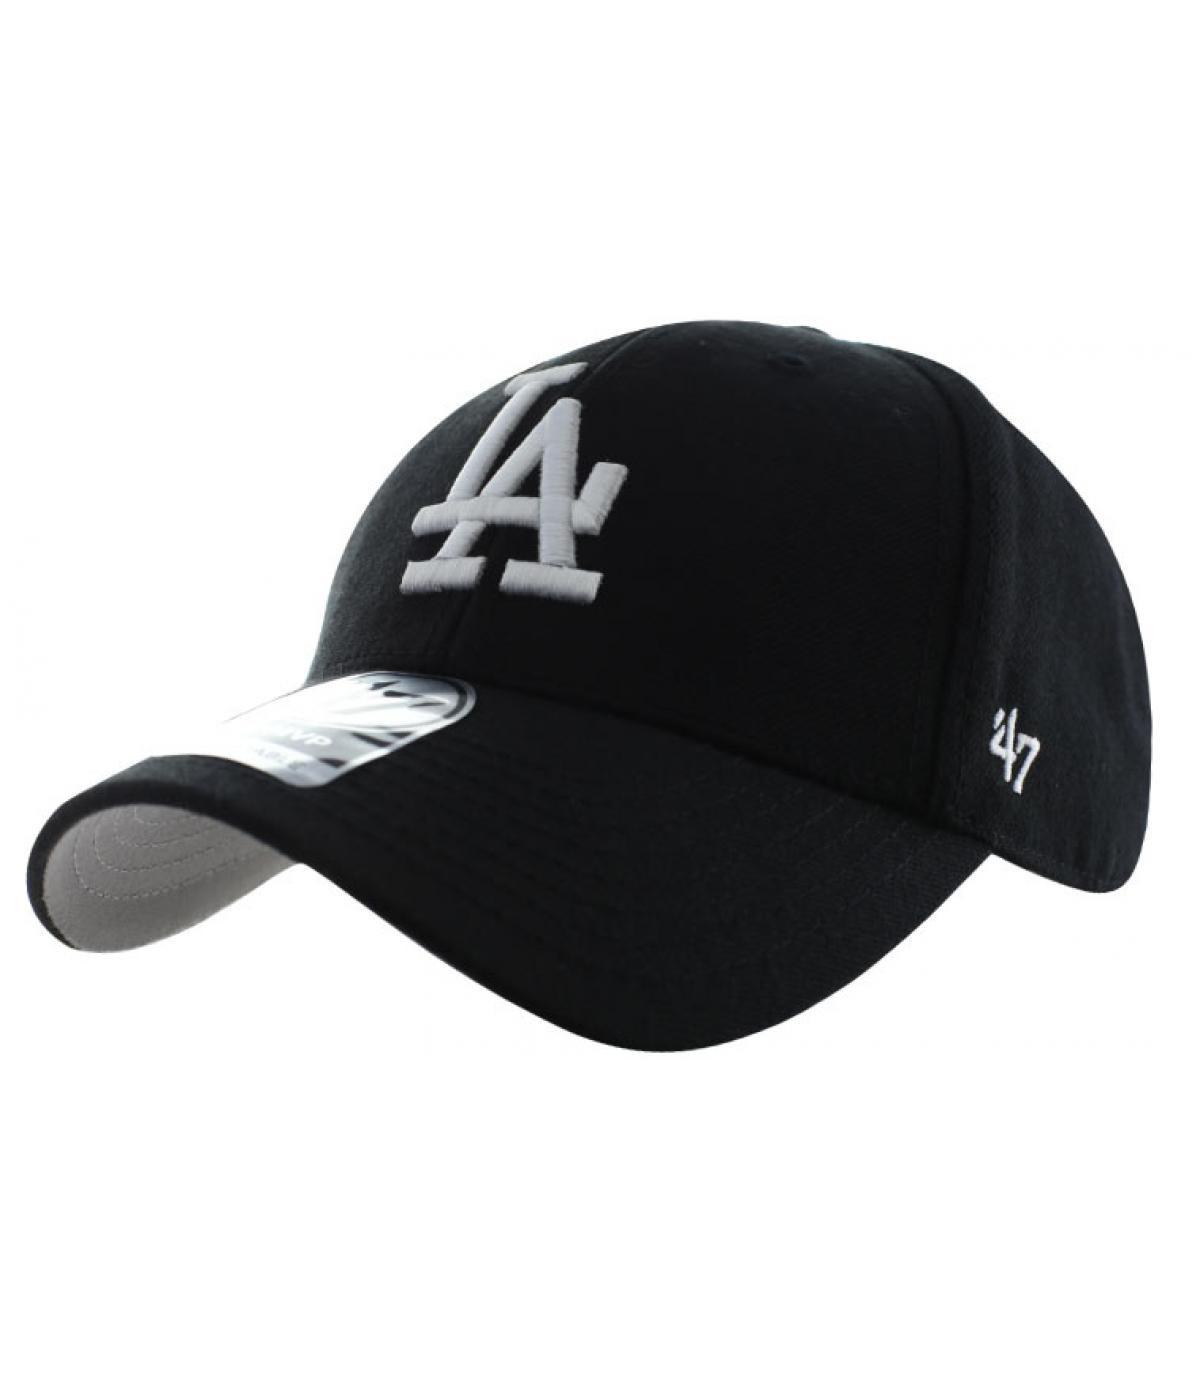 Dettagli MVP LA Dodgers black - image 2